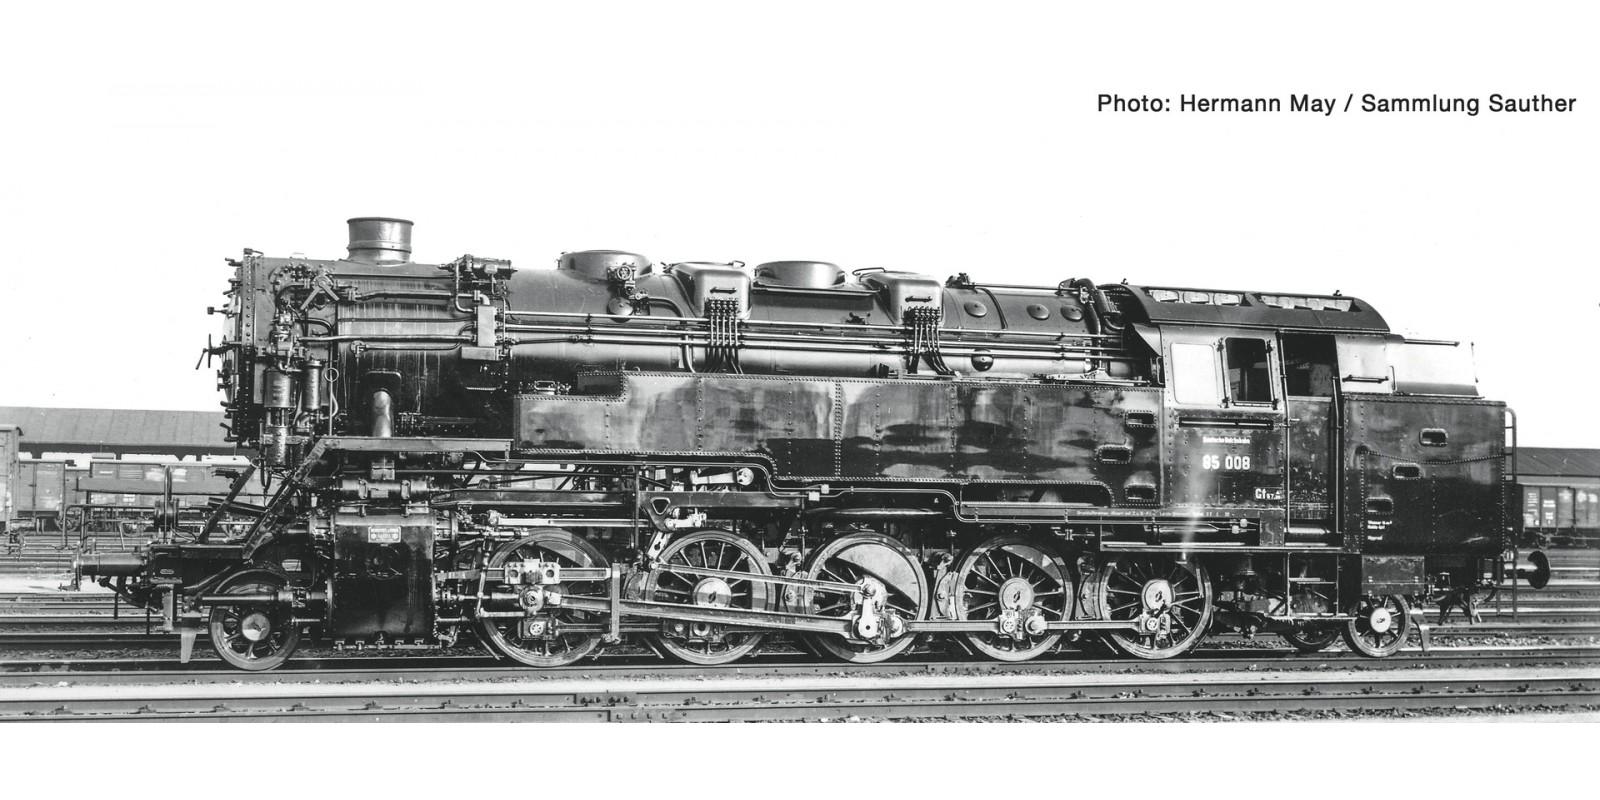 RO78262 - Steam locomotive 85 008, DRG